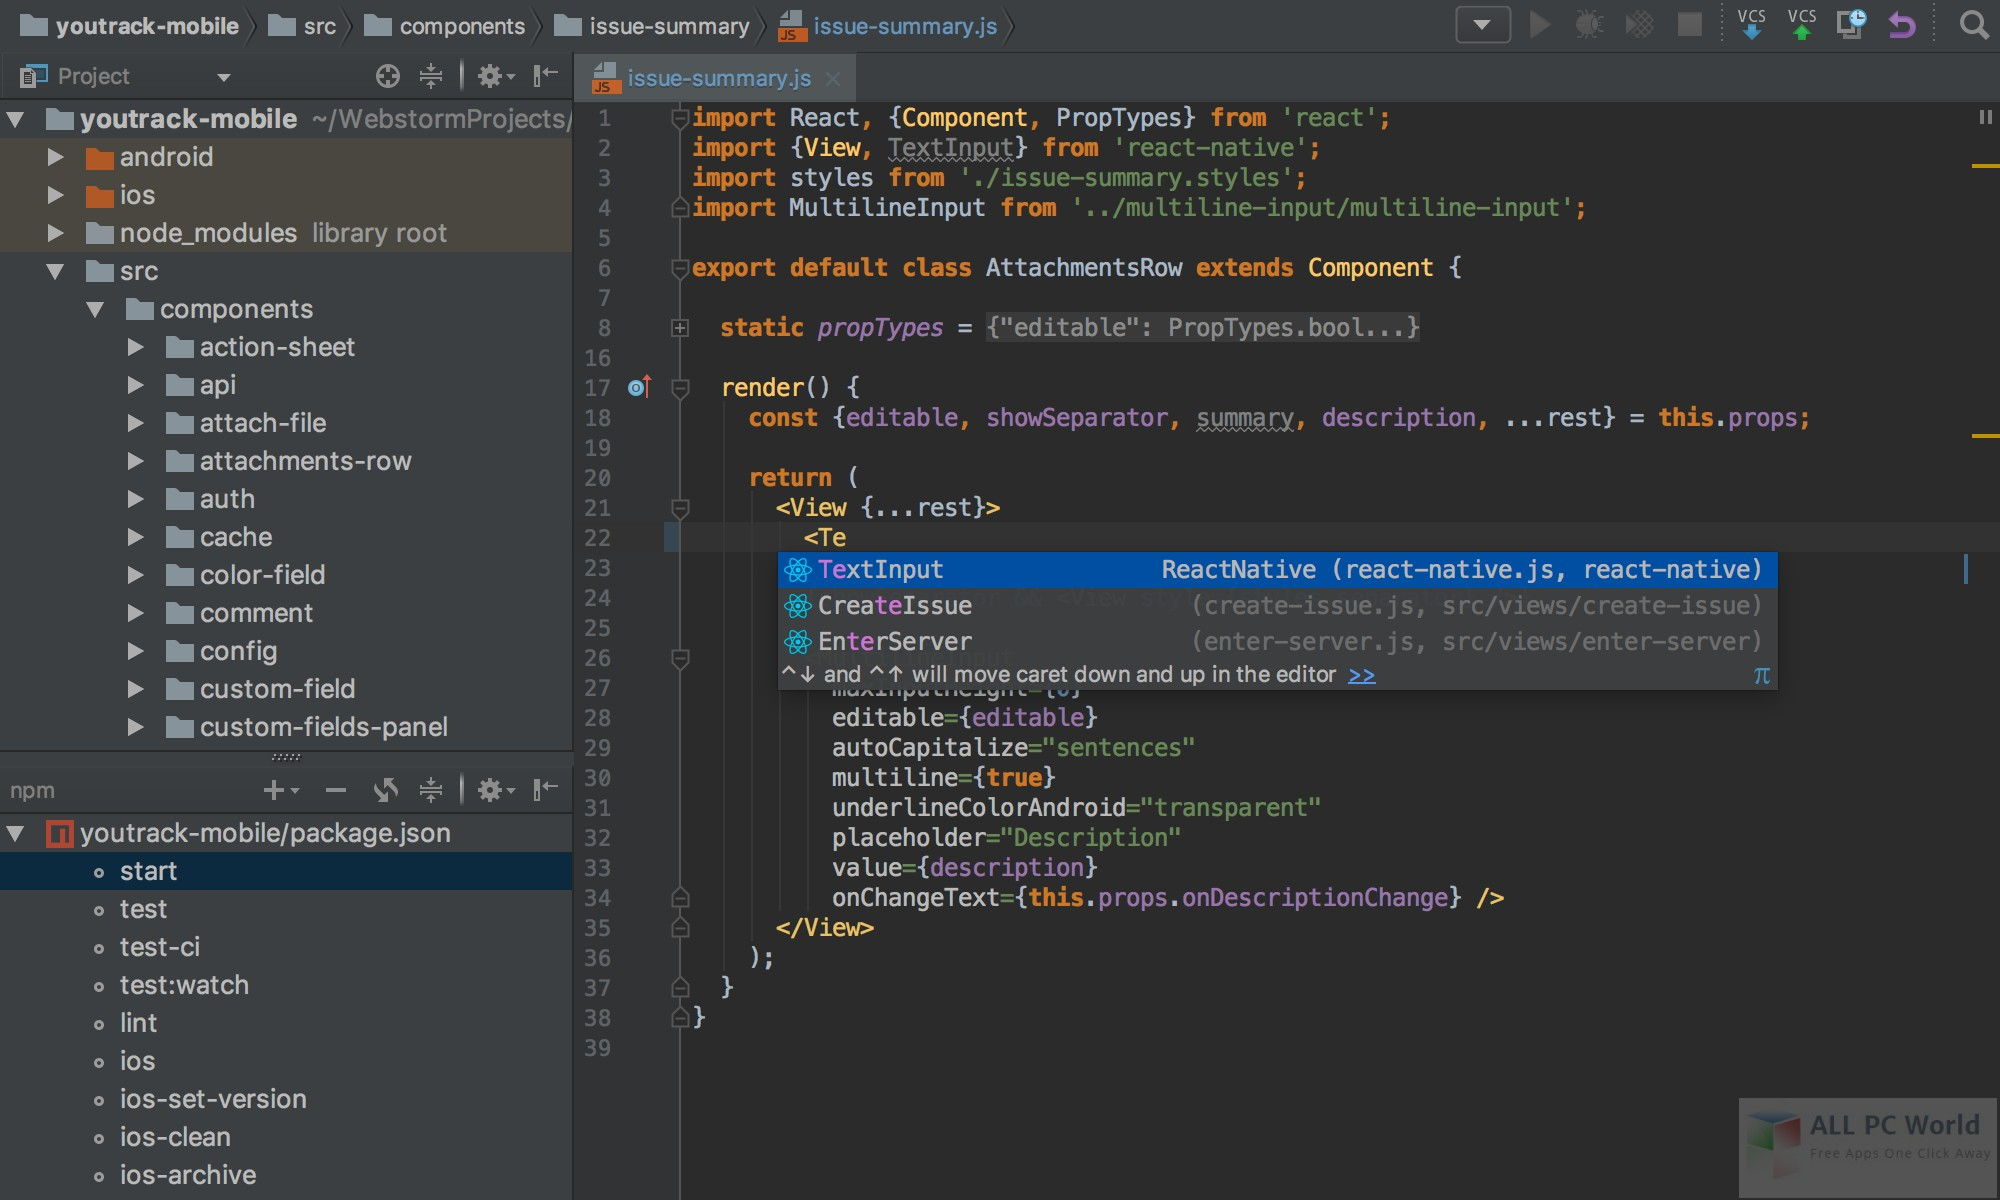 JetBrains RubyMine 2018 Free Download